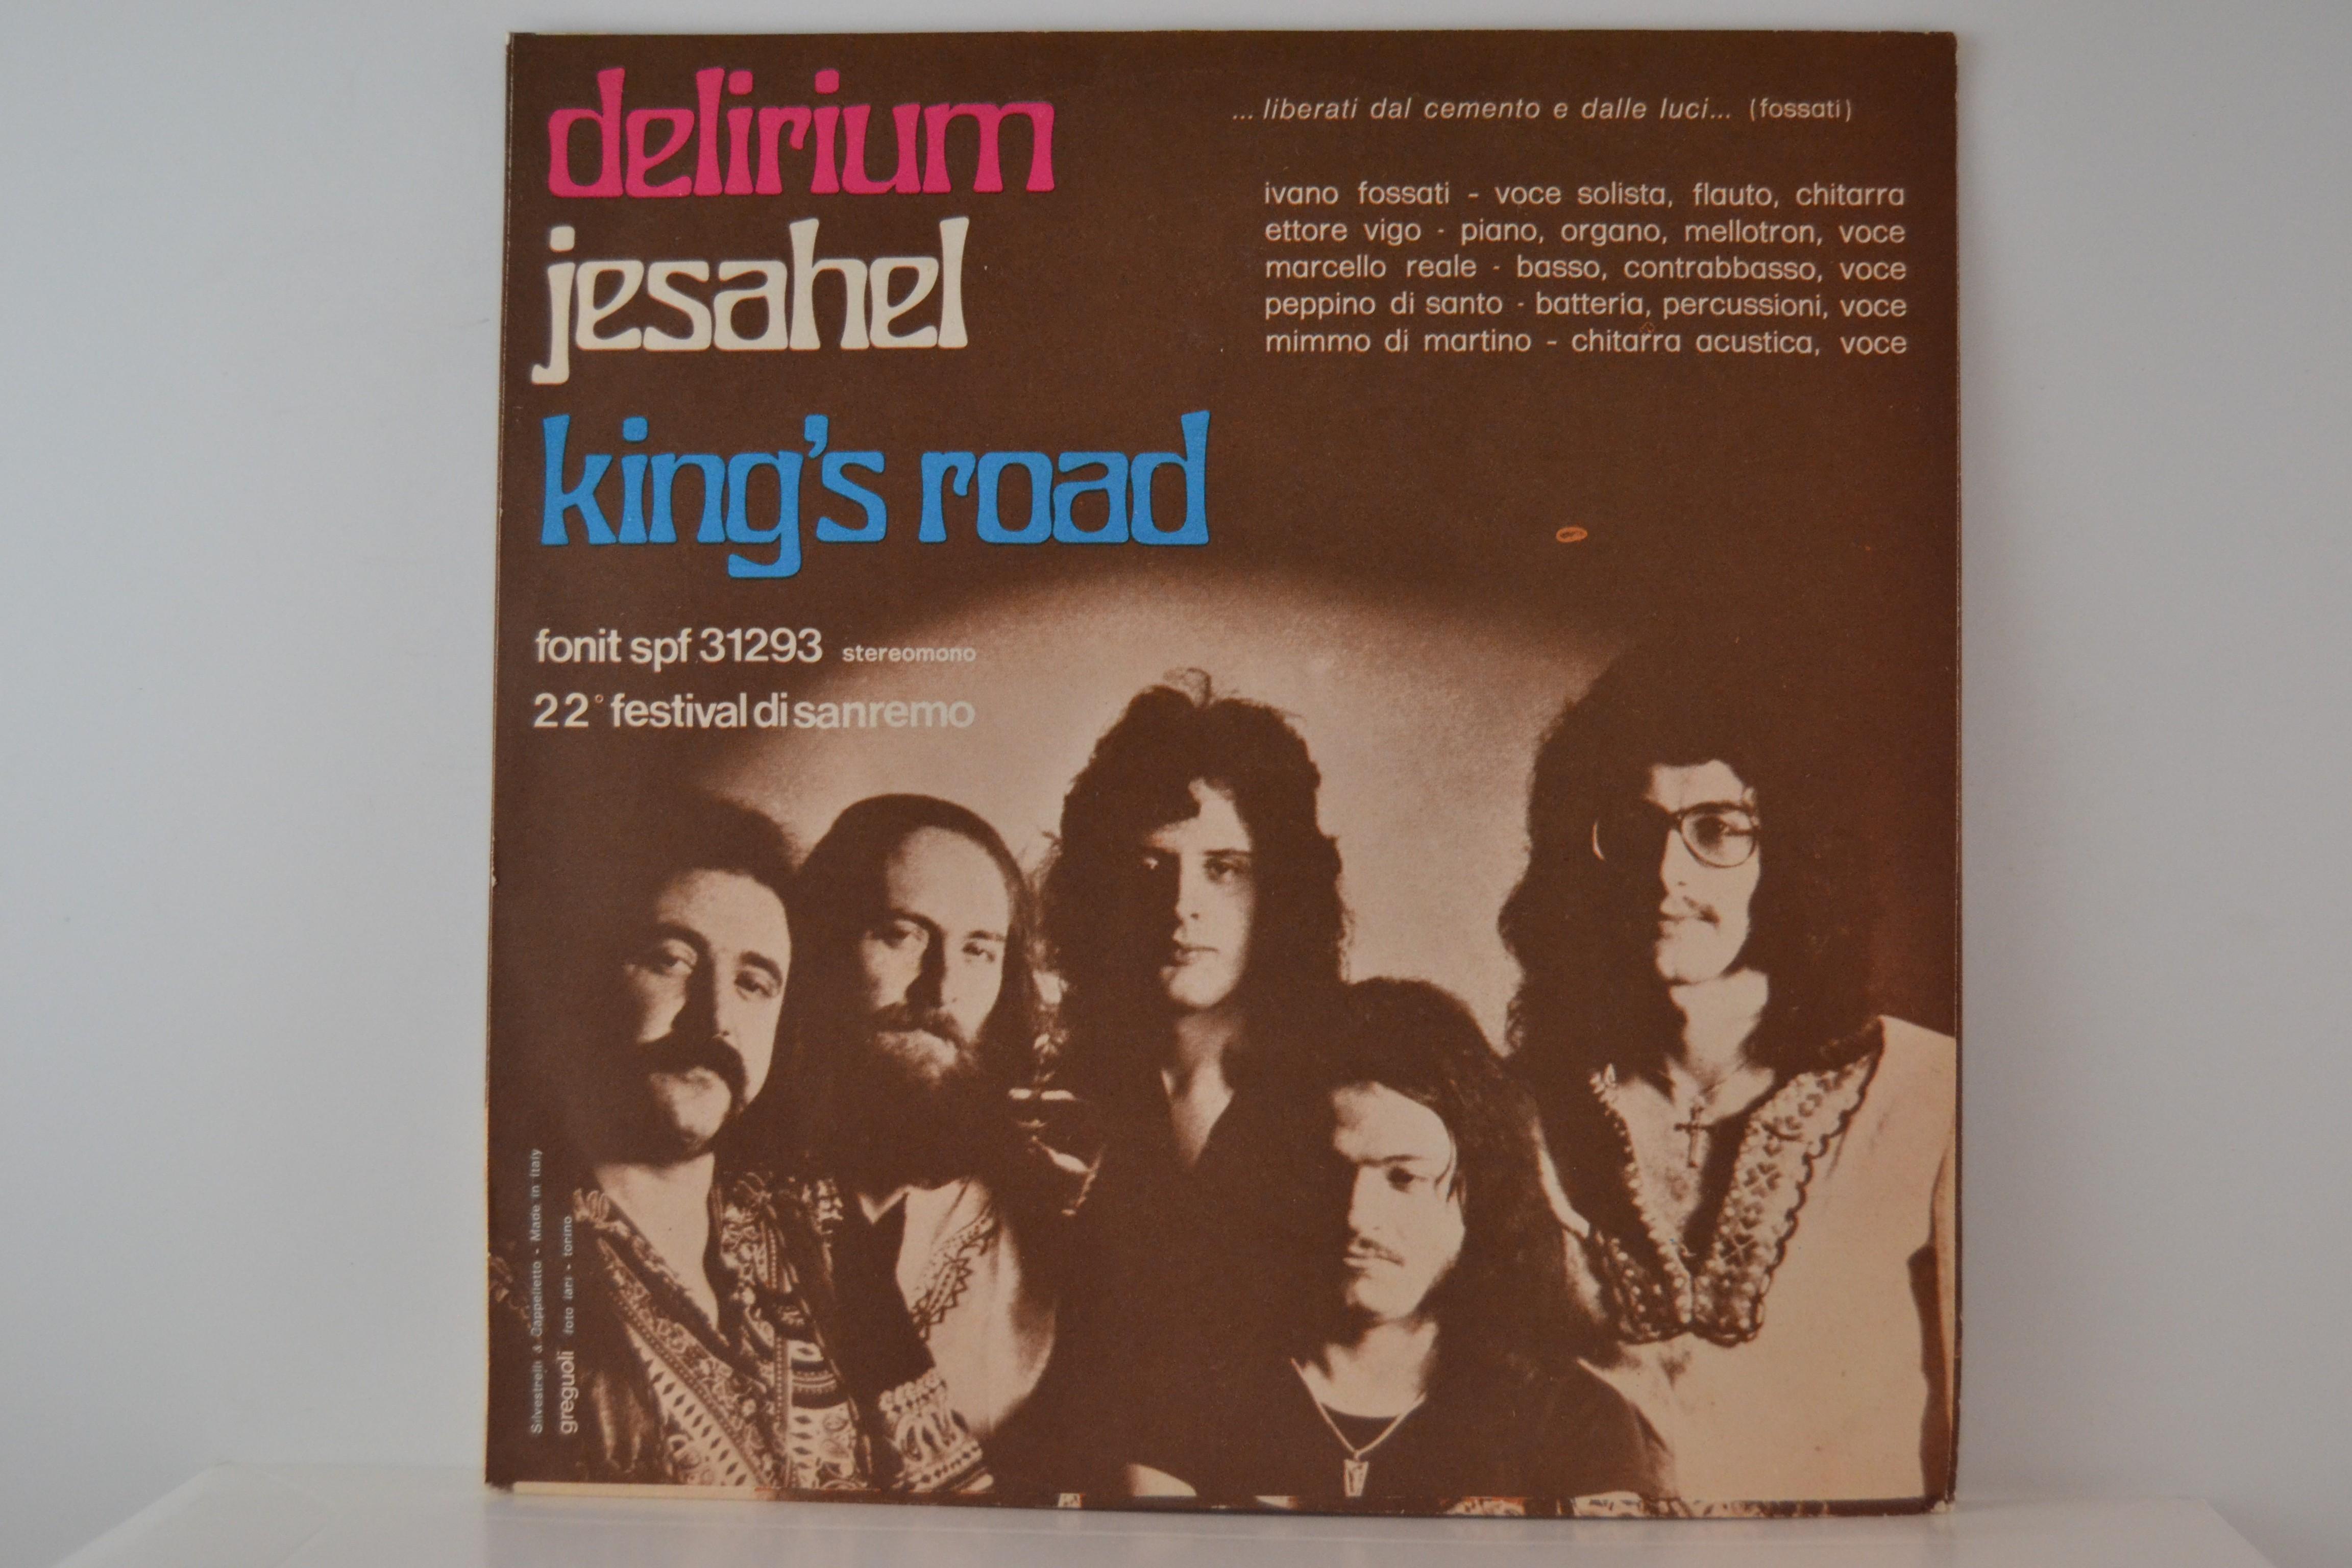 DELIRIUM : King's road / Jesahel